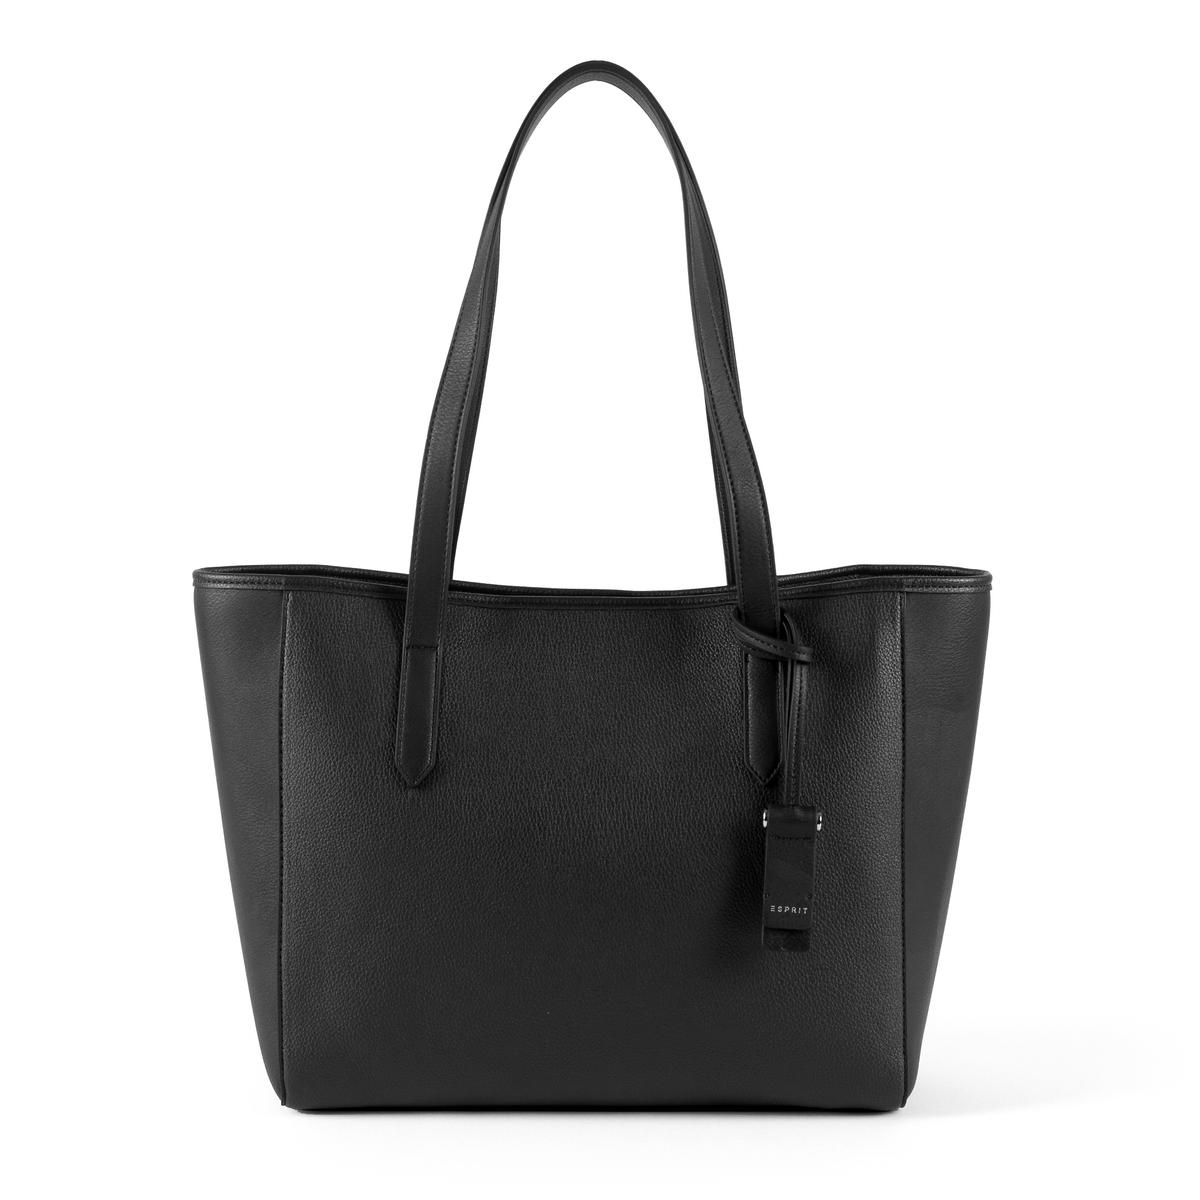 Сумка-шоппер Tatumsh сумка esprit cc6010f 469